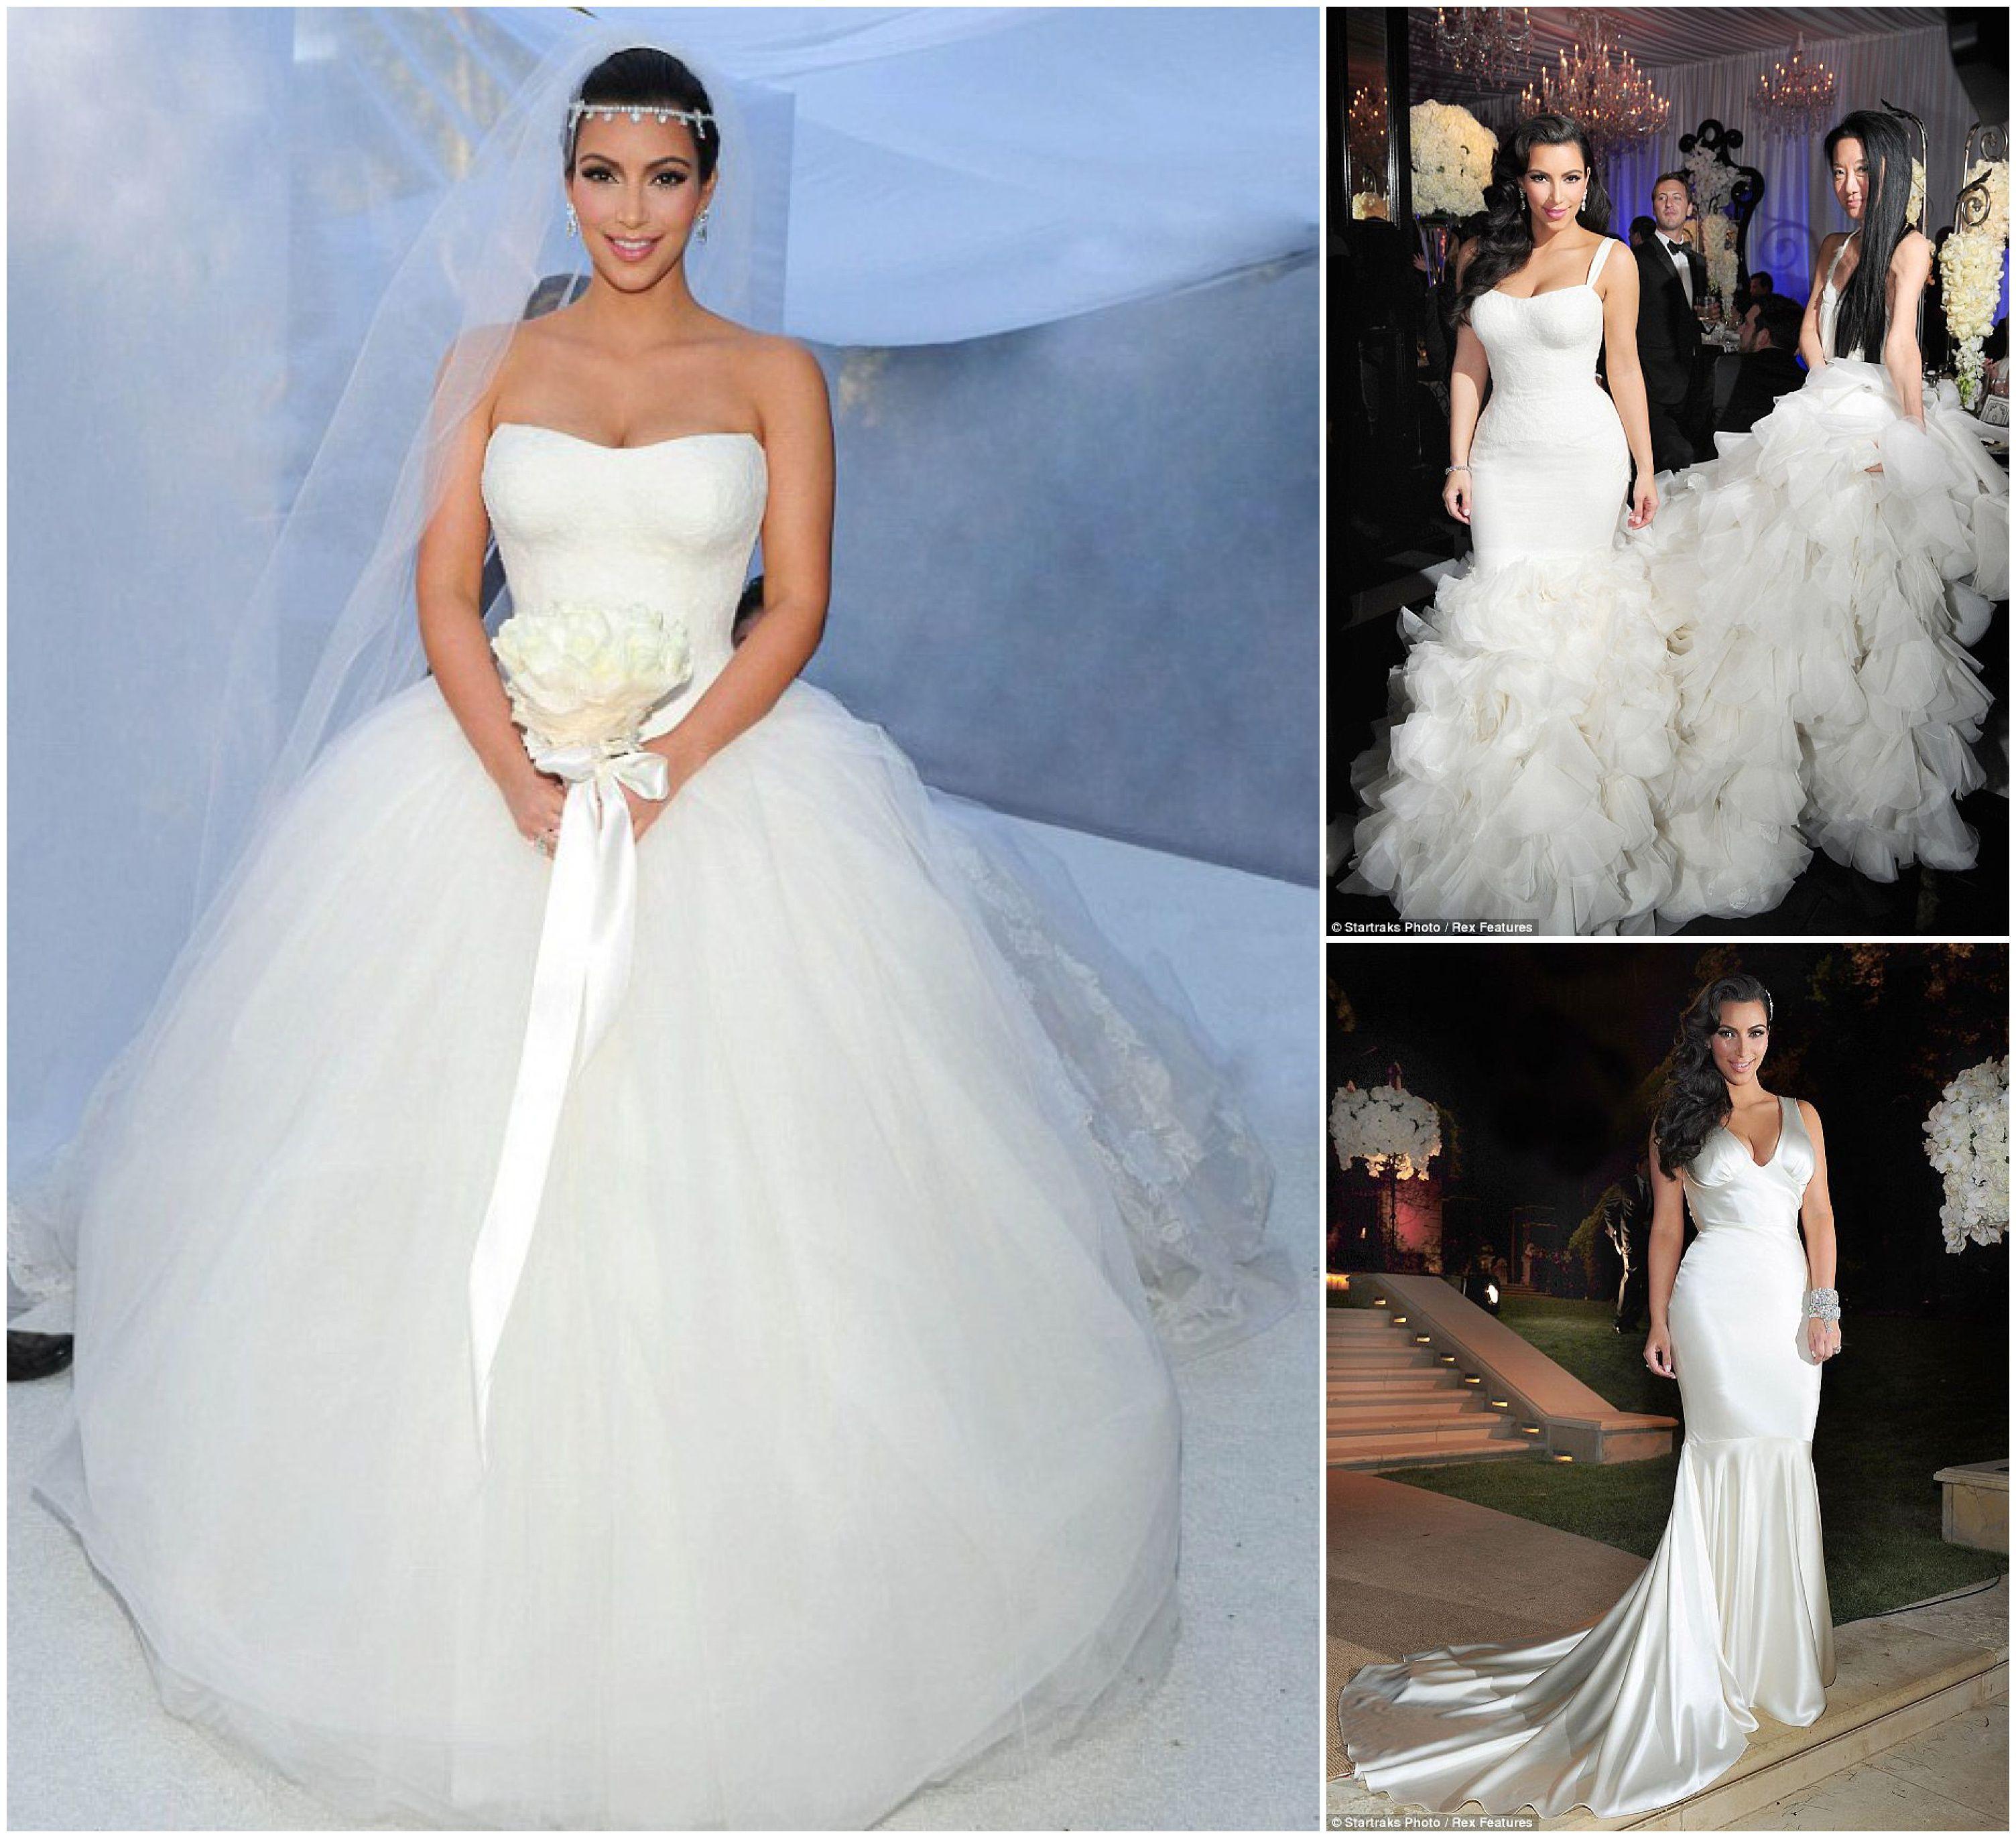 Wedding News Kim Kardashian S Wedding Dresses Kim Kardashian And Kris H Kim Kardashian Wedding Dress Kris Kim Kardashian Wedding Dress Givenchy Wedding Dress